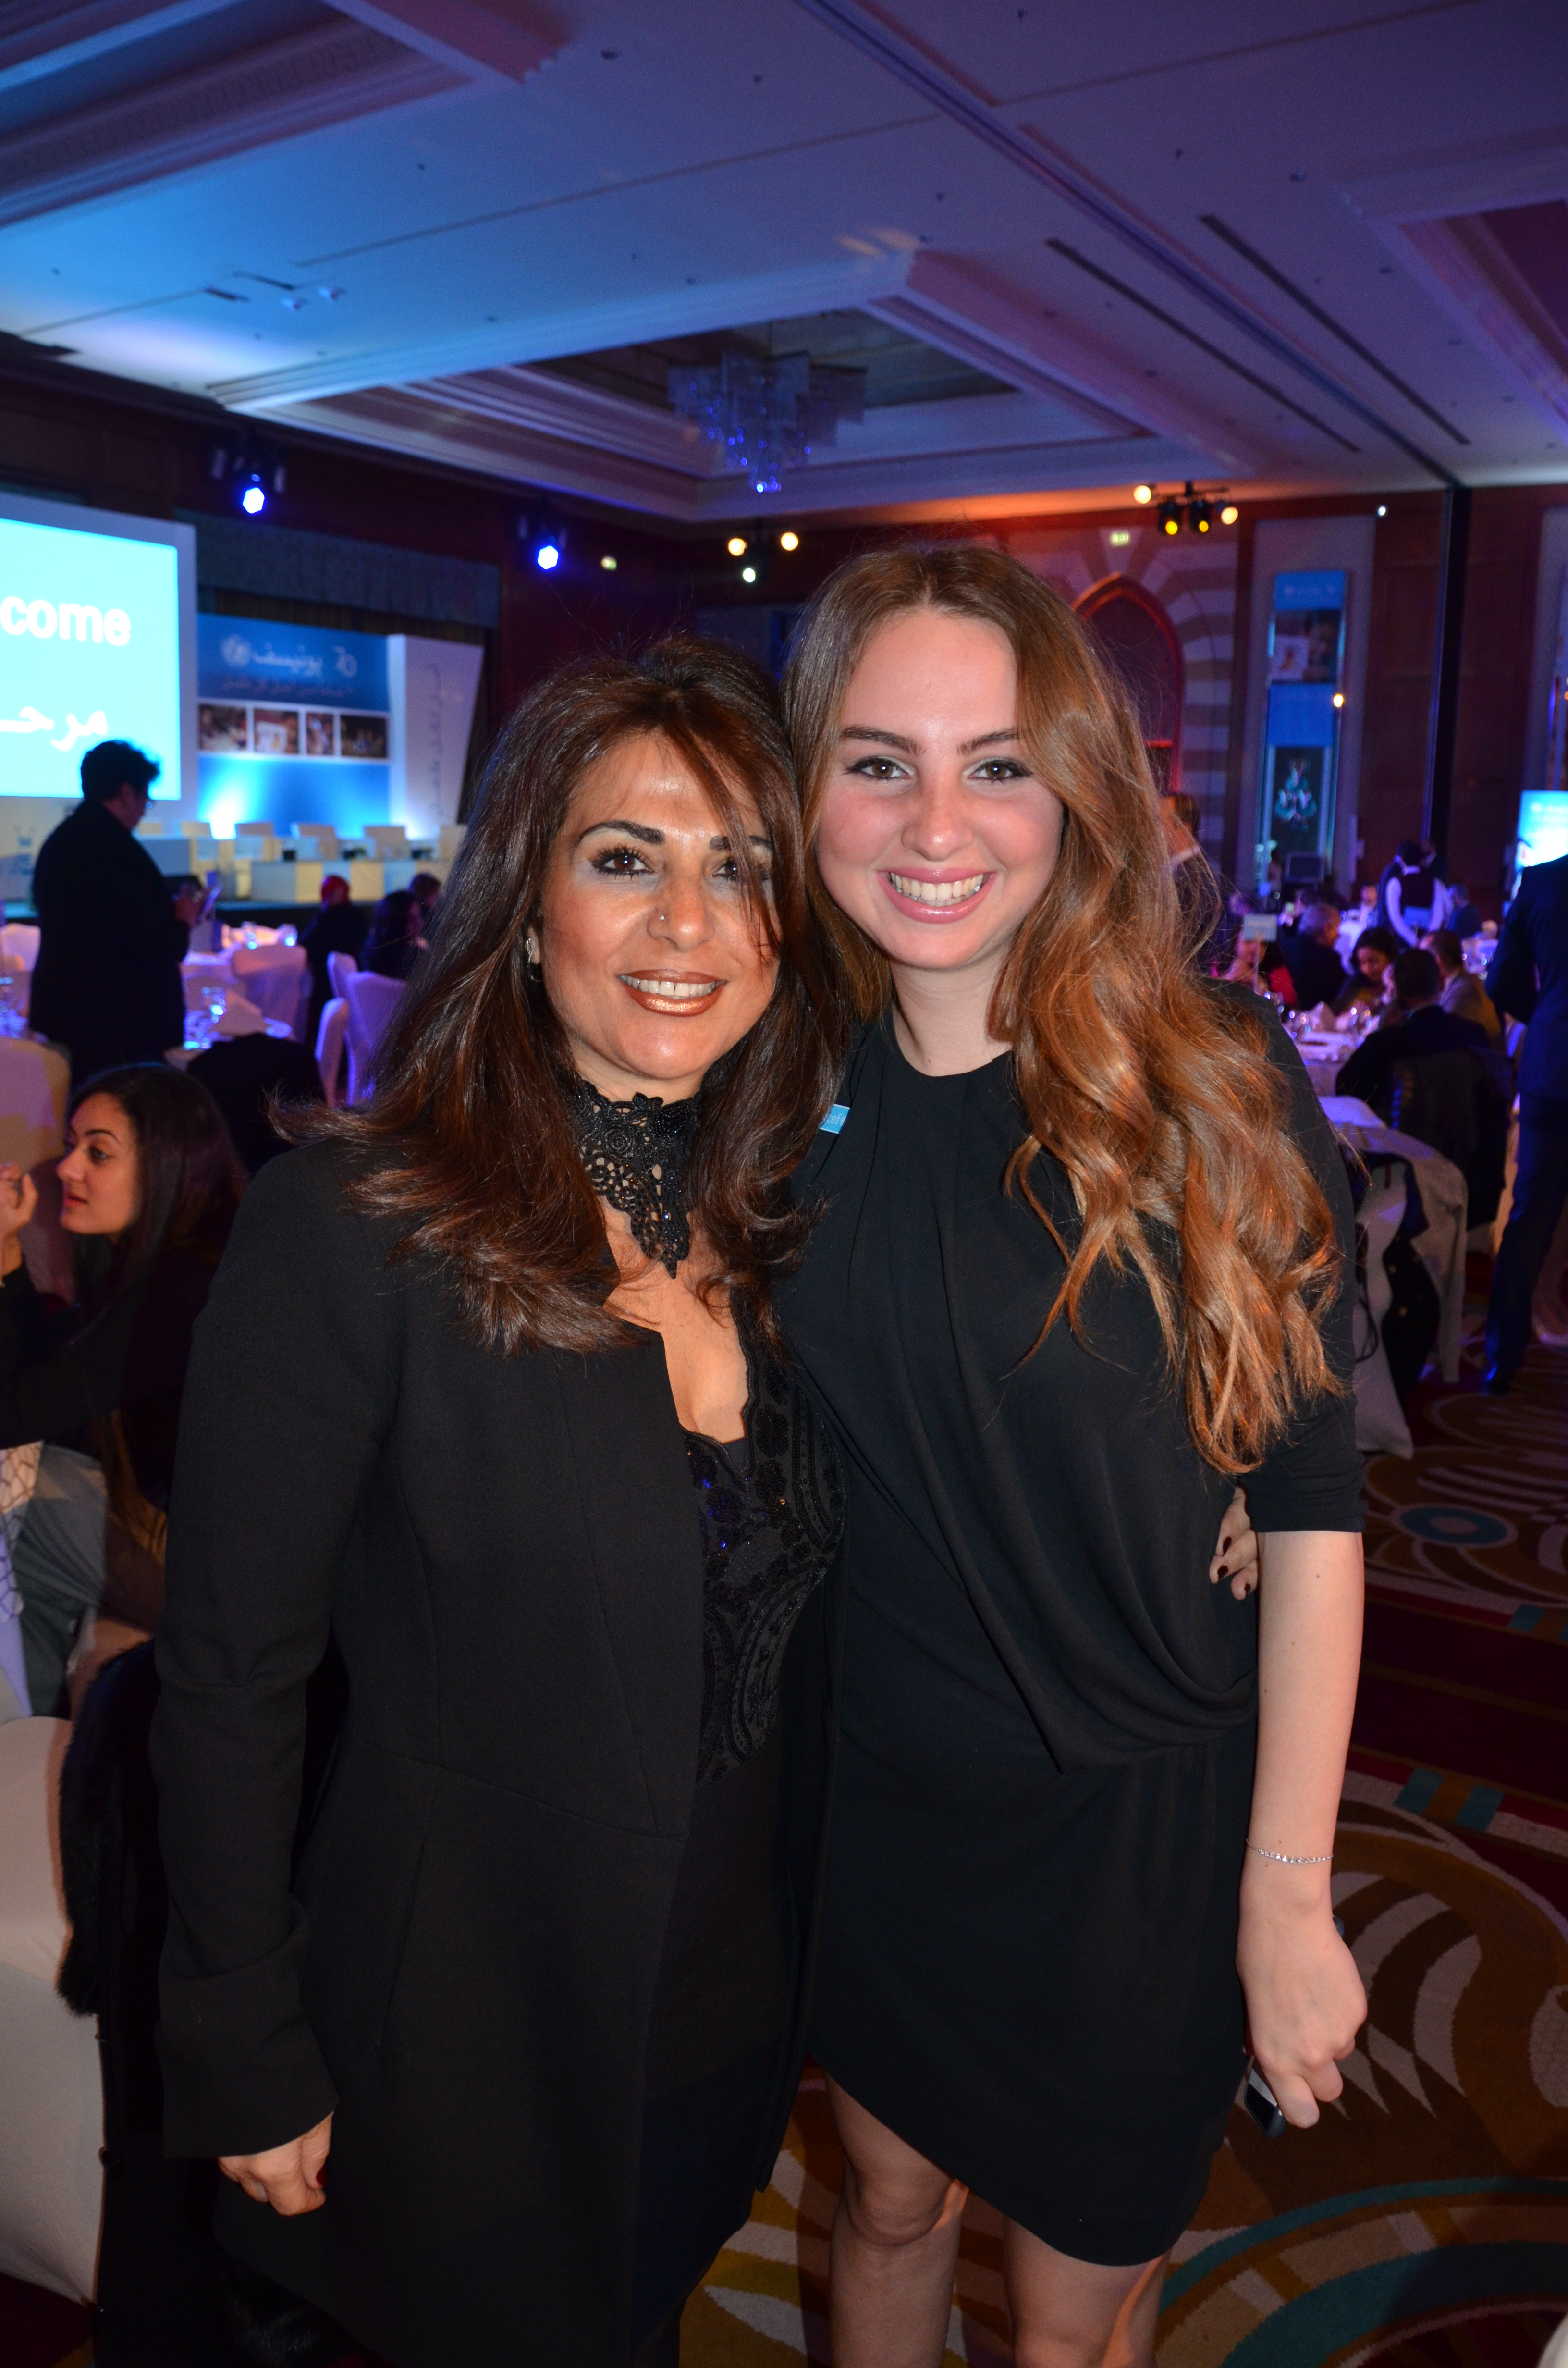 Ms. Nermine Ehsan & Ms. Dina Ashraf